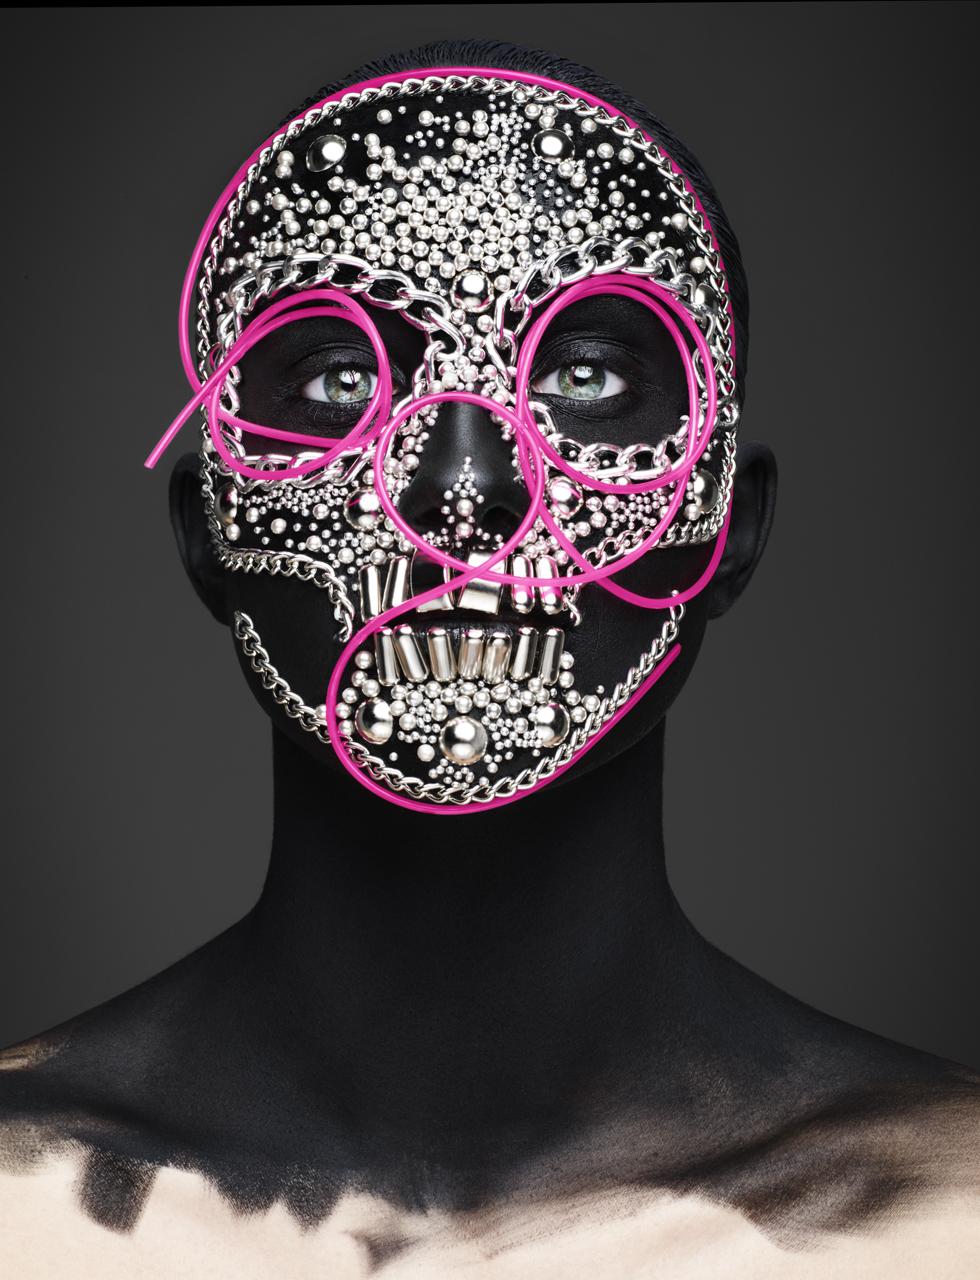 andrew-gallimore-diadelasmuertes-masks-03